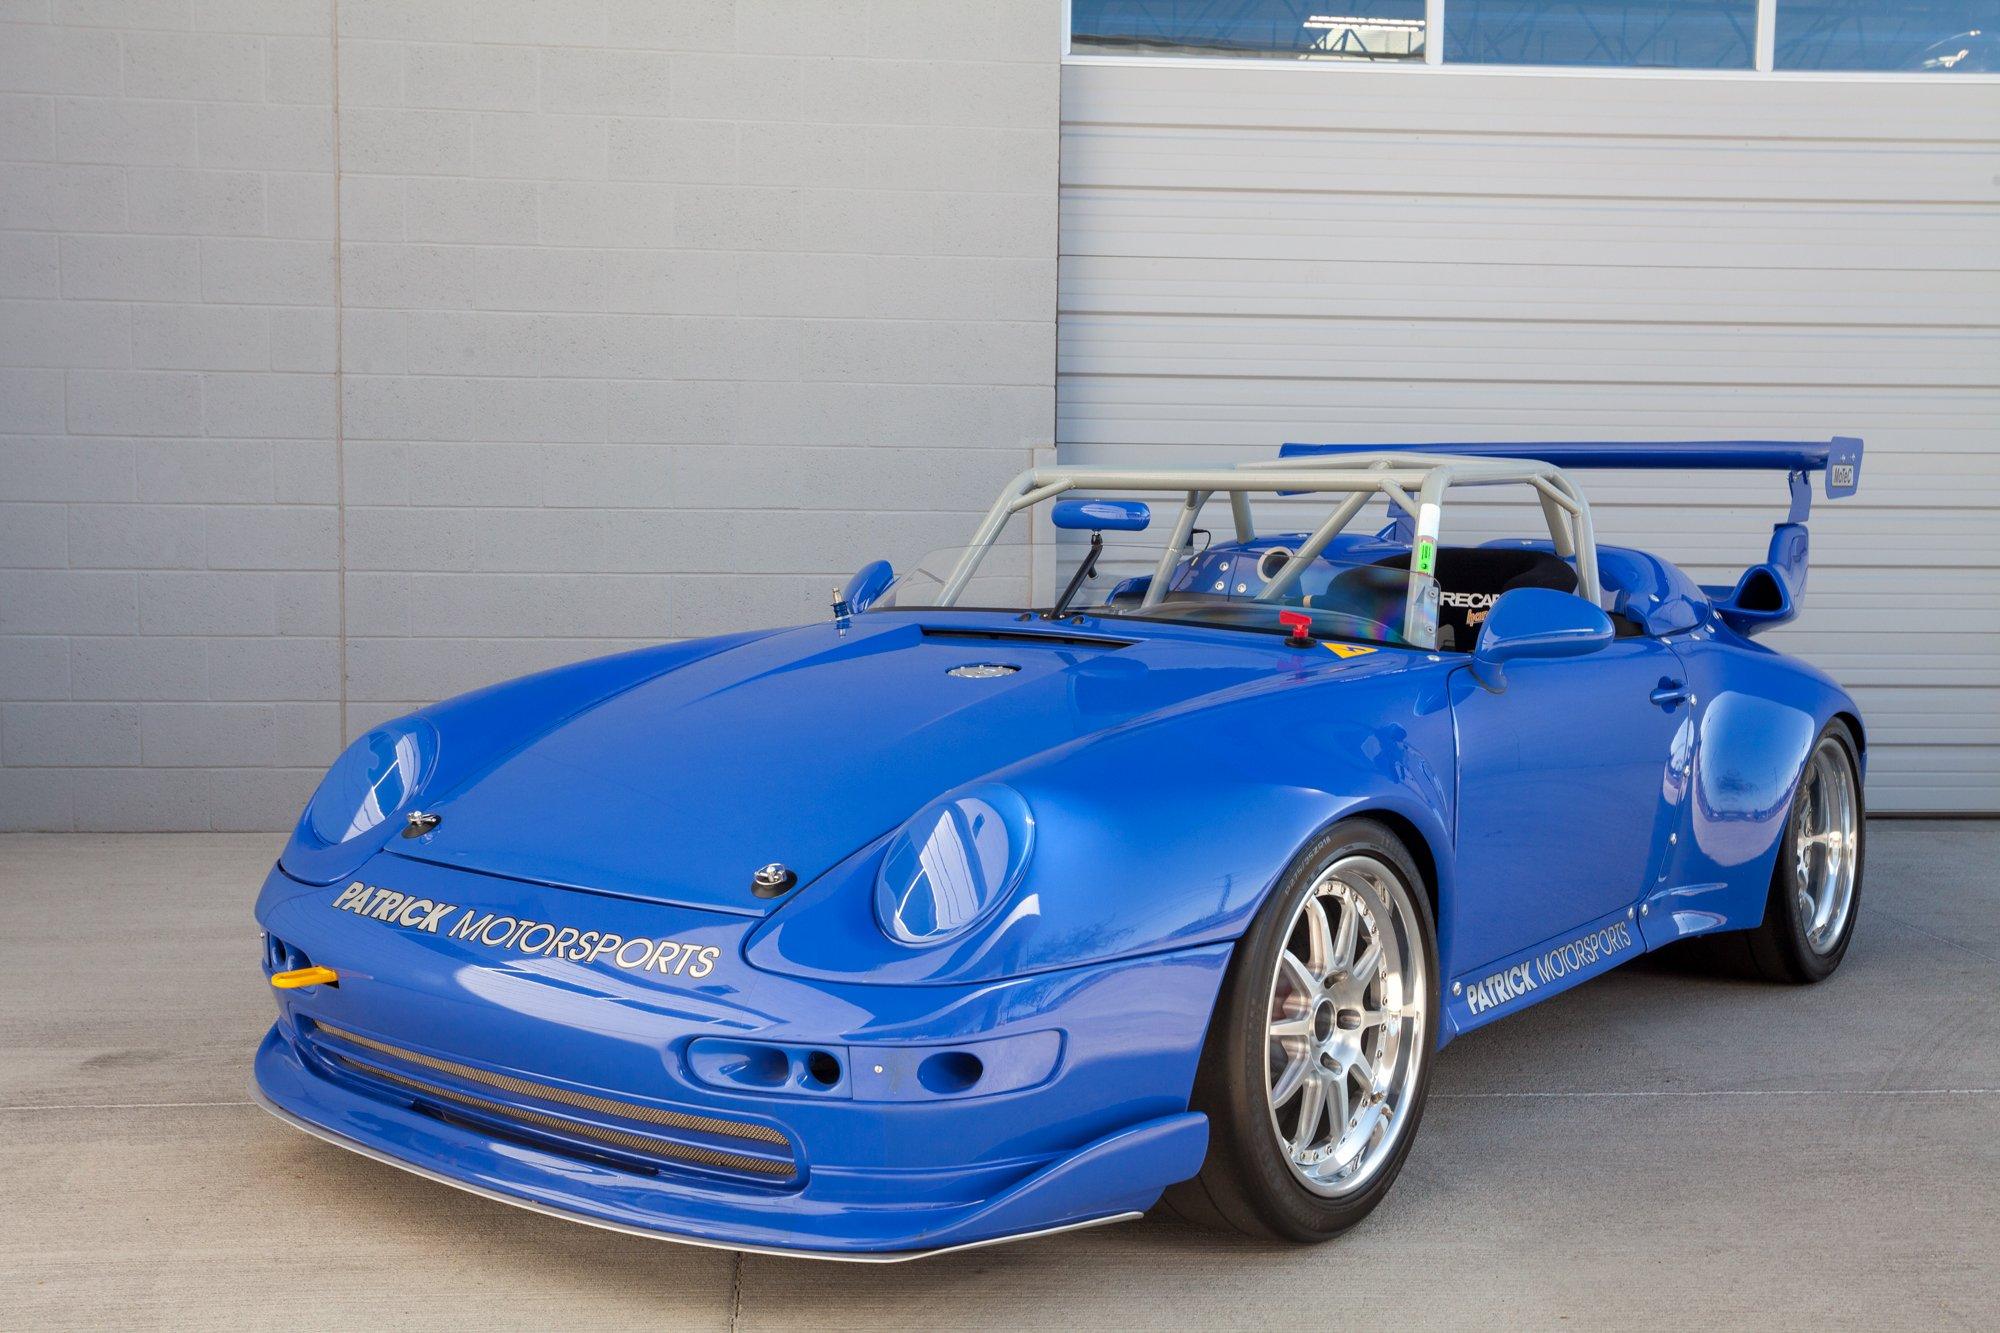 Porsche 993 Race Car with a 3.8 L Flat-Six